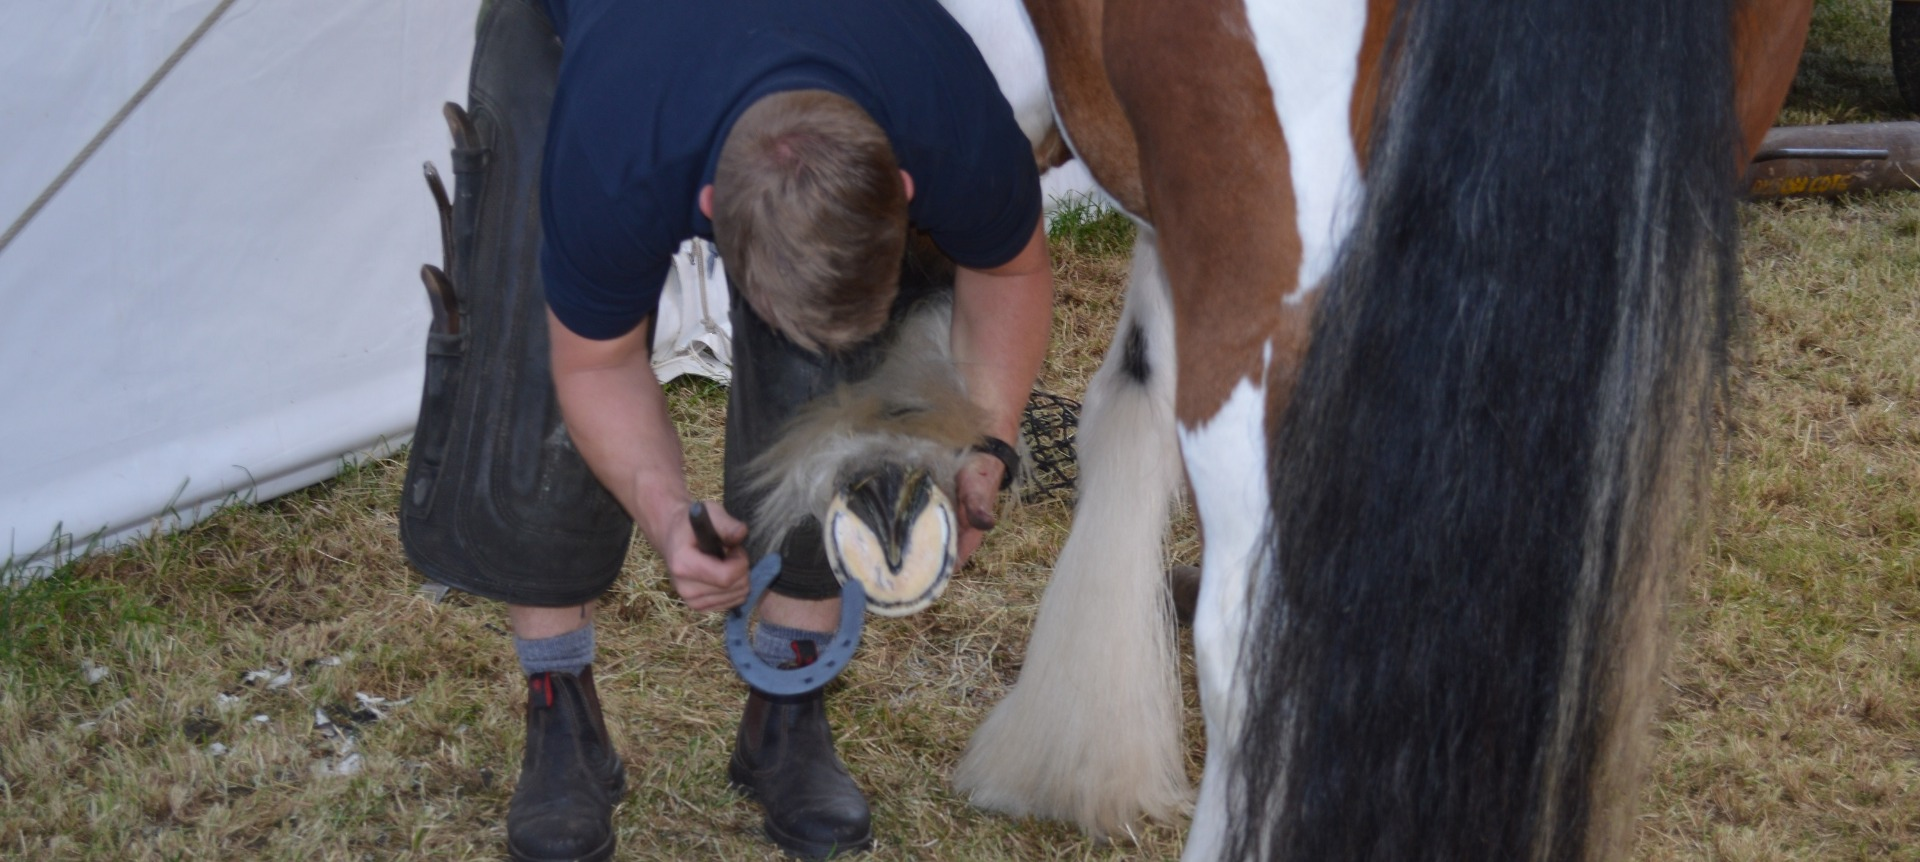 Dan Lowe Friday on the Farm